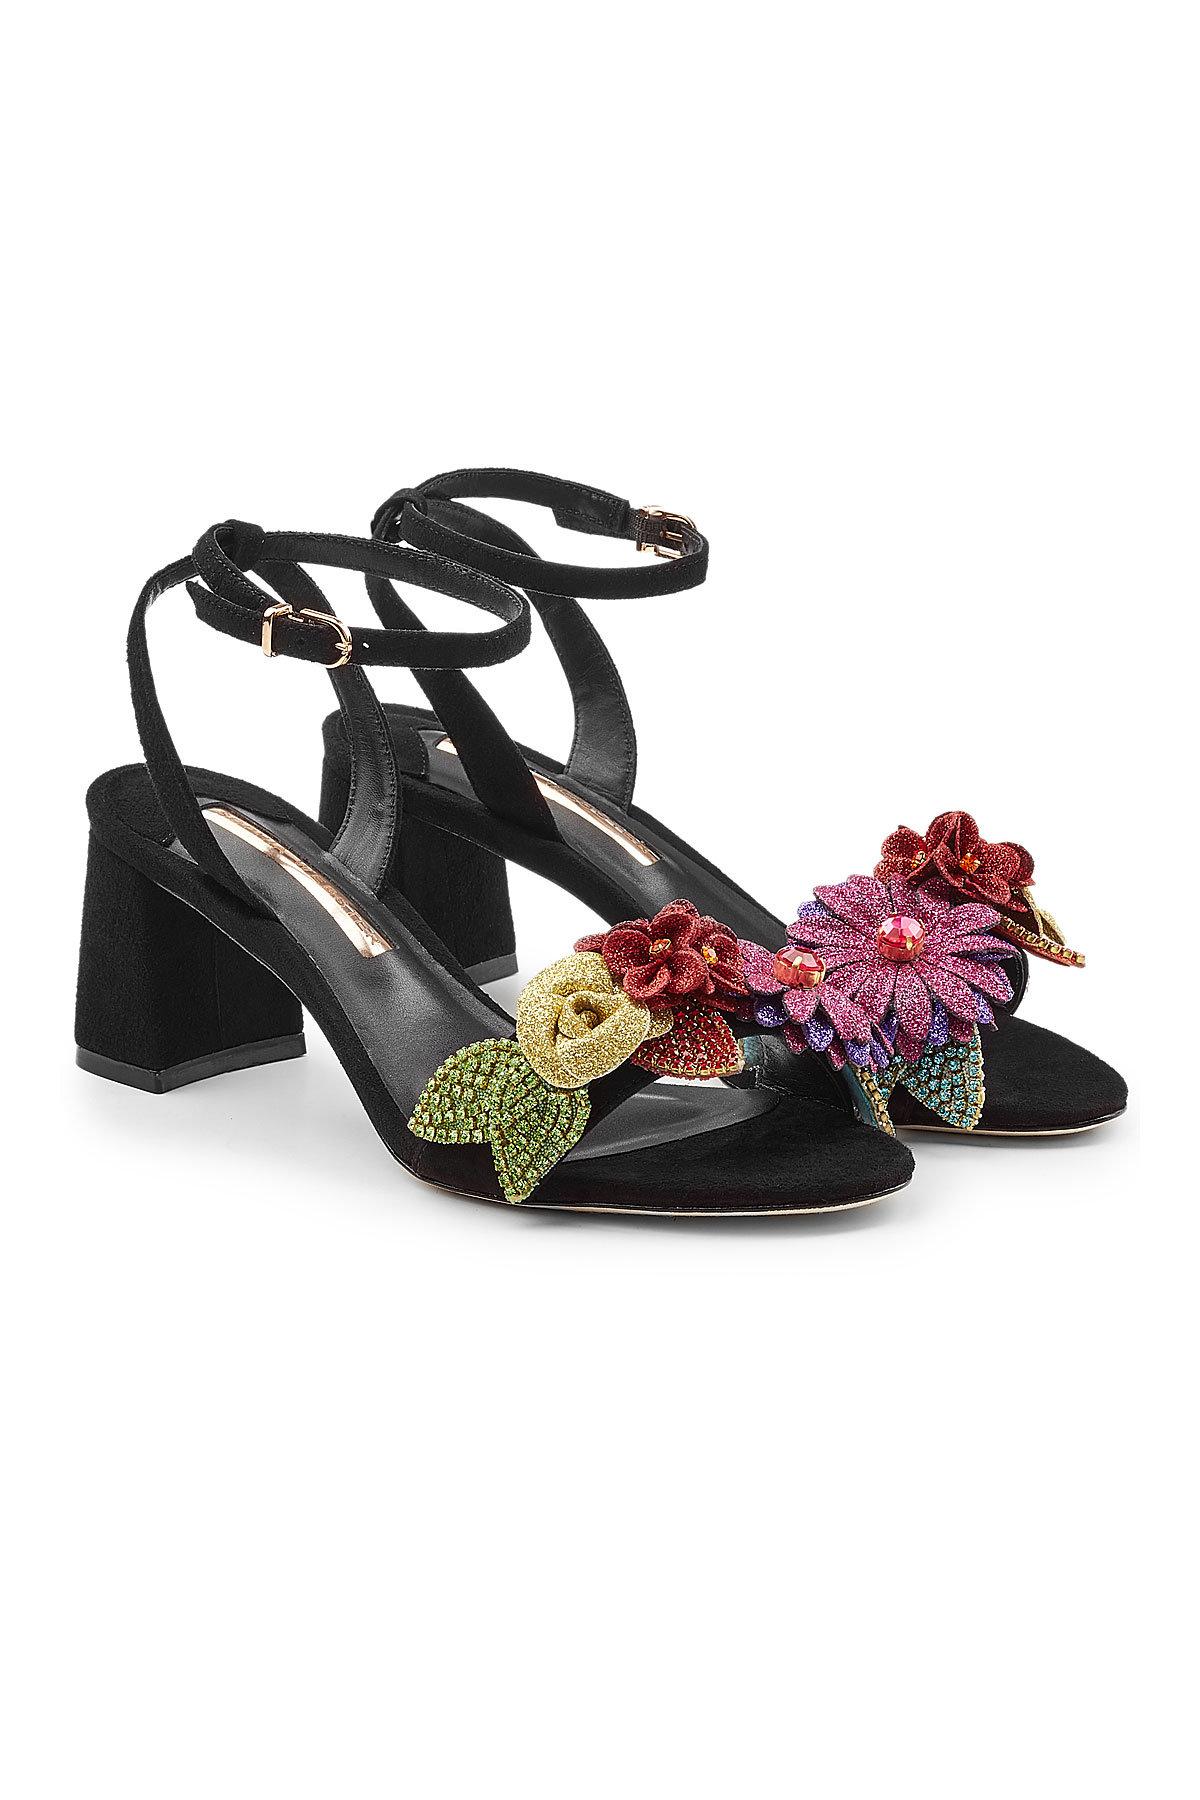 SOPHIA WEBSTER Lilico Glitter Suede Sandals Gr. EU 38 sX0bc0